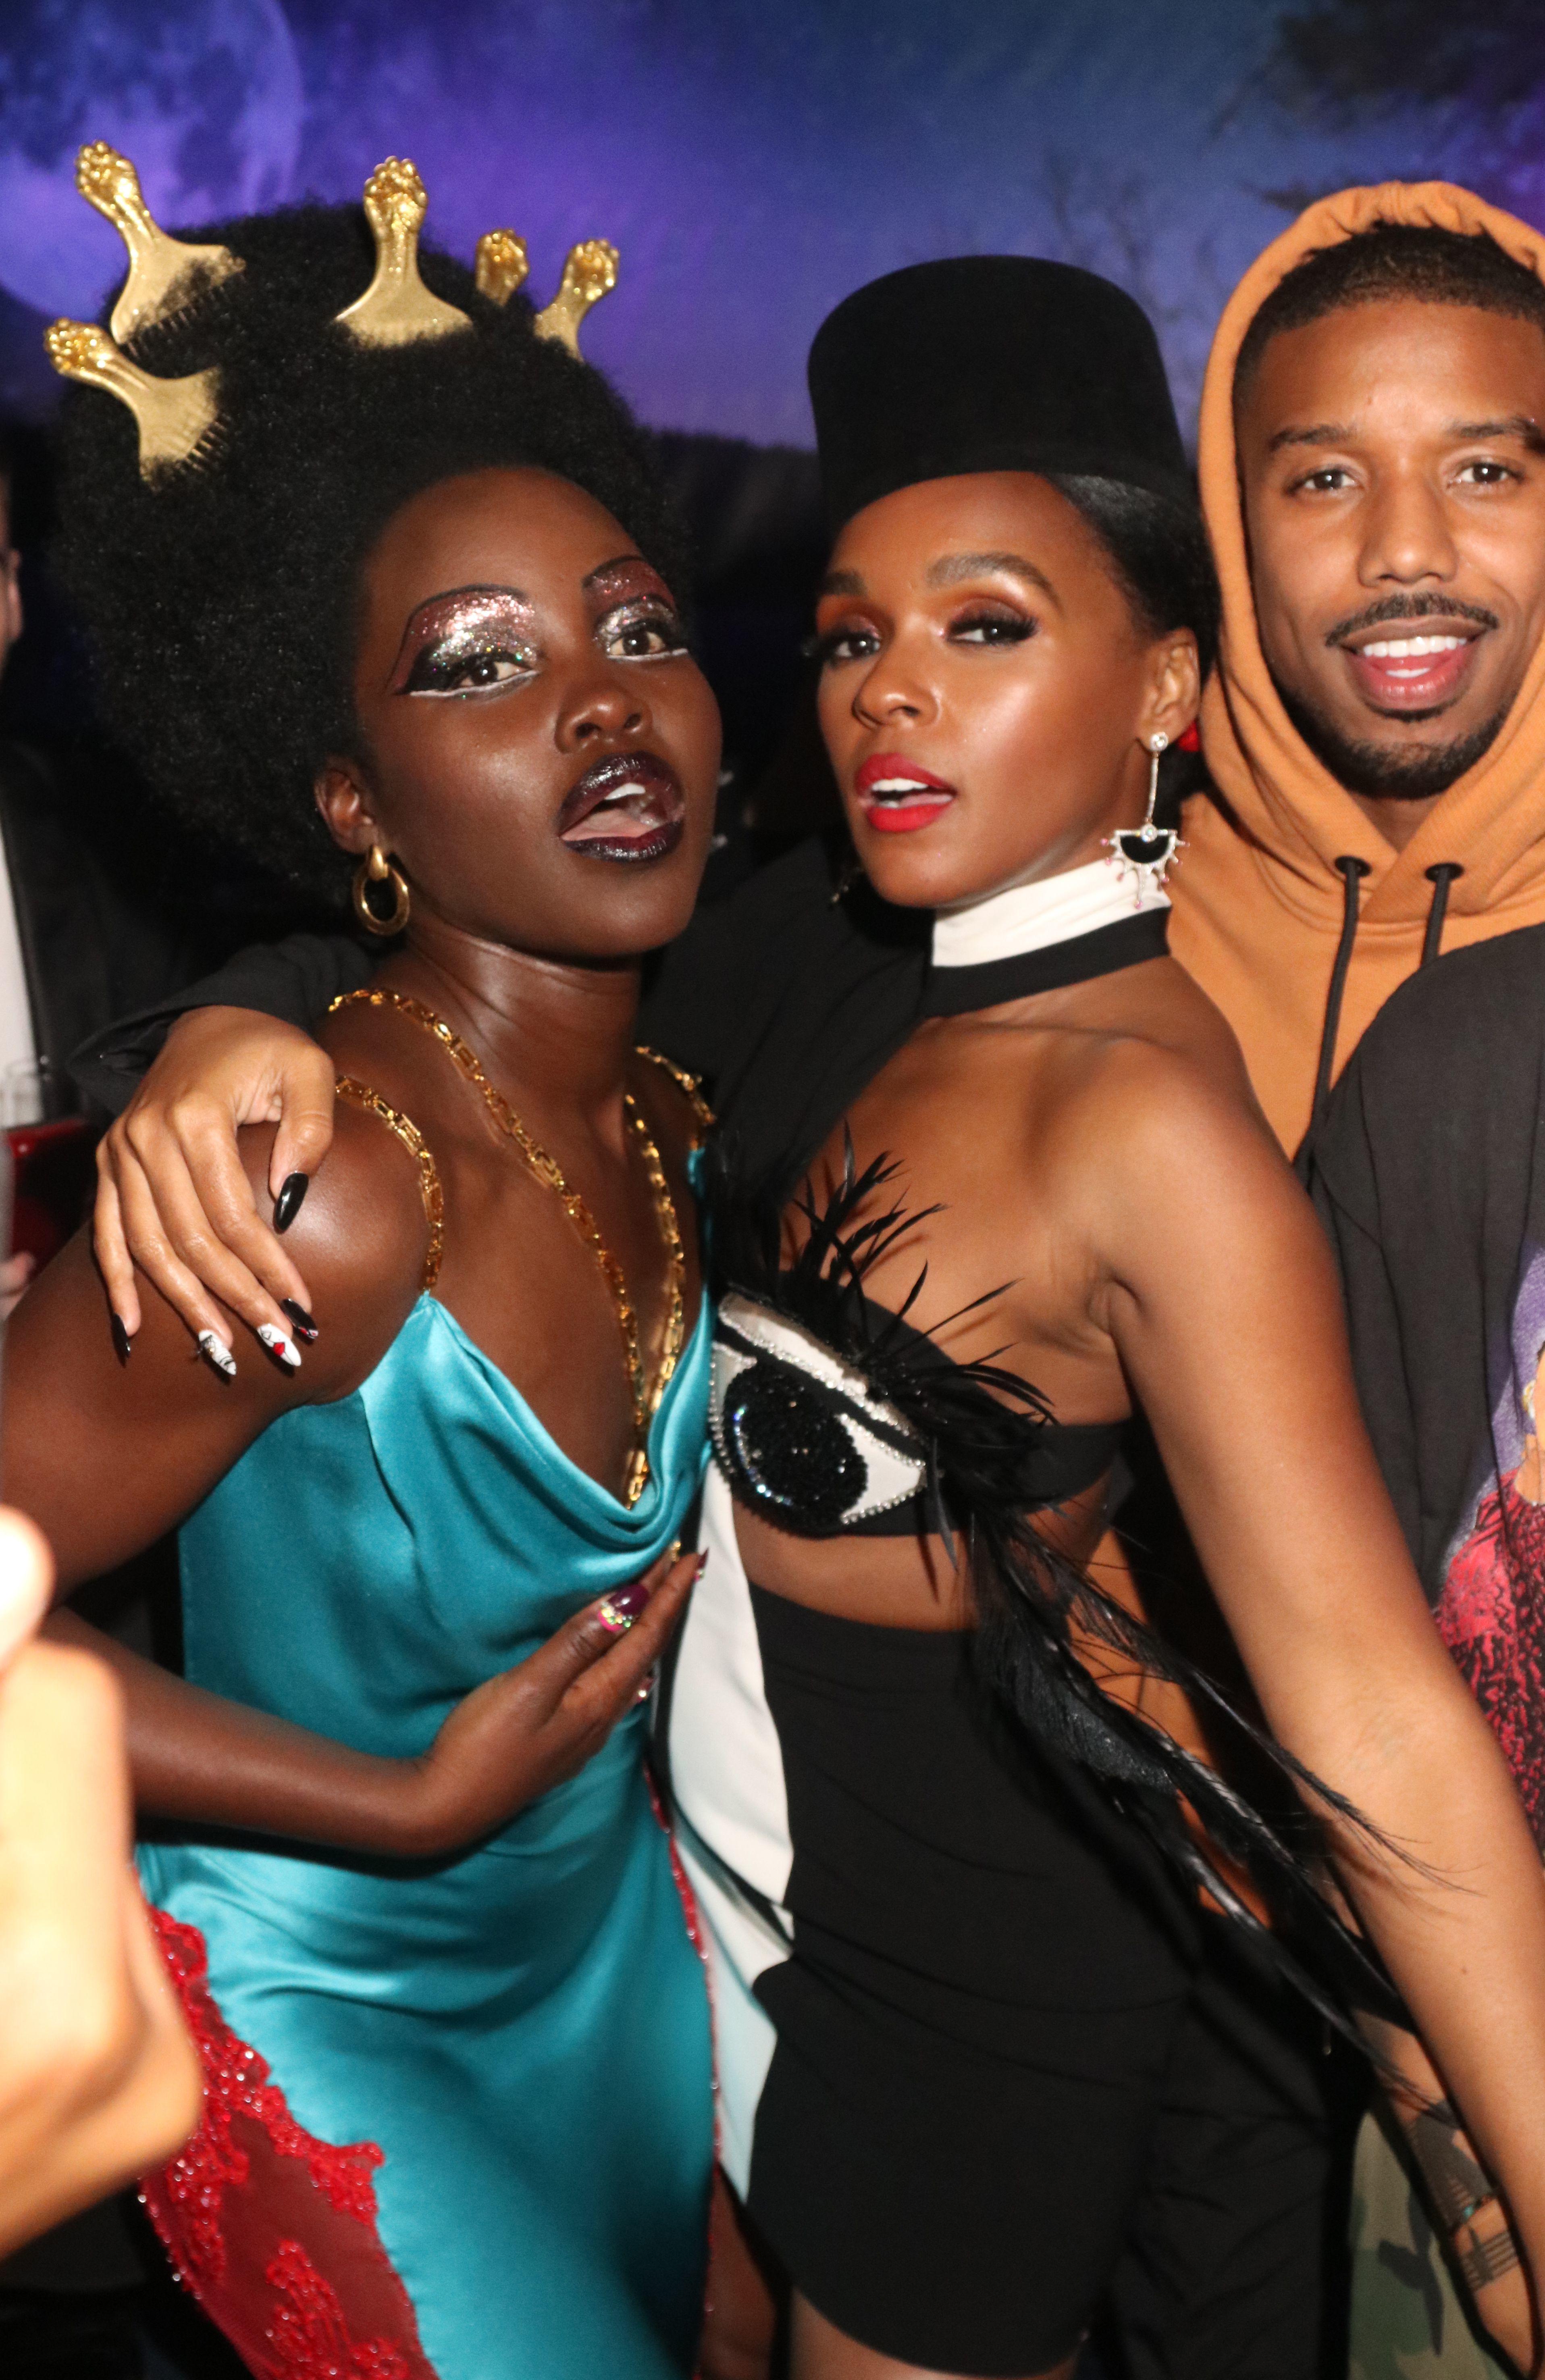 Lupita Nyong'o, Janelle Monae and Michael B. Jordan hang out at Kim Kardashian West's Met Gala afterparty at Up & Down in New York City on May 6, 2019.